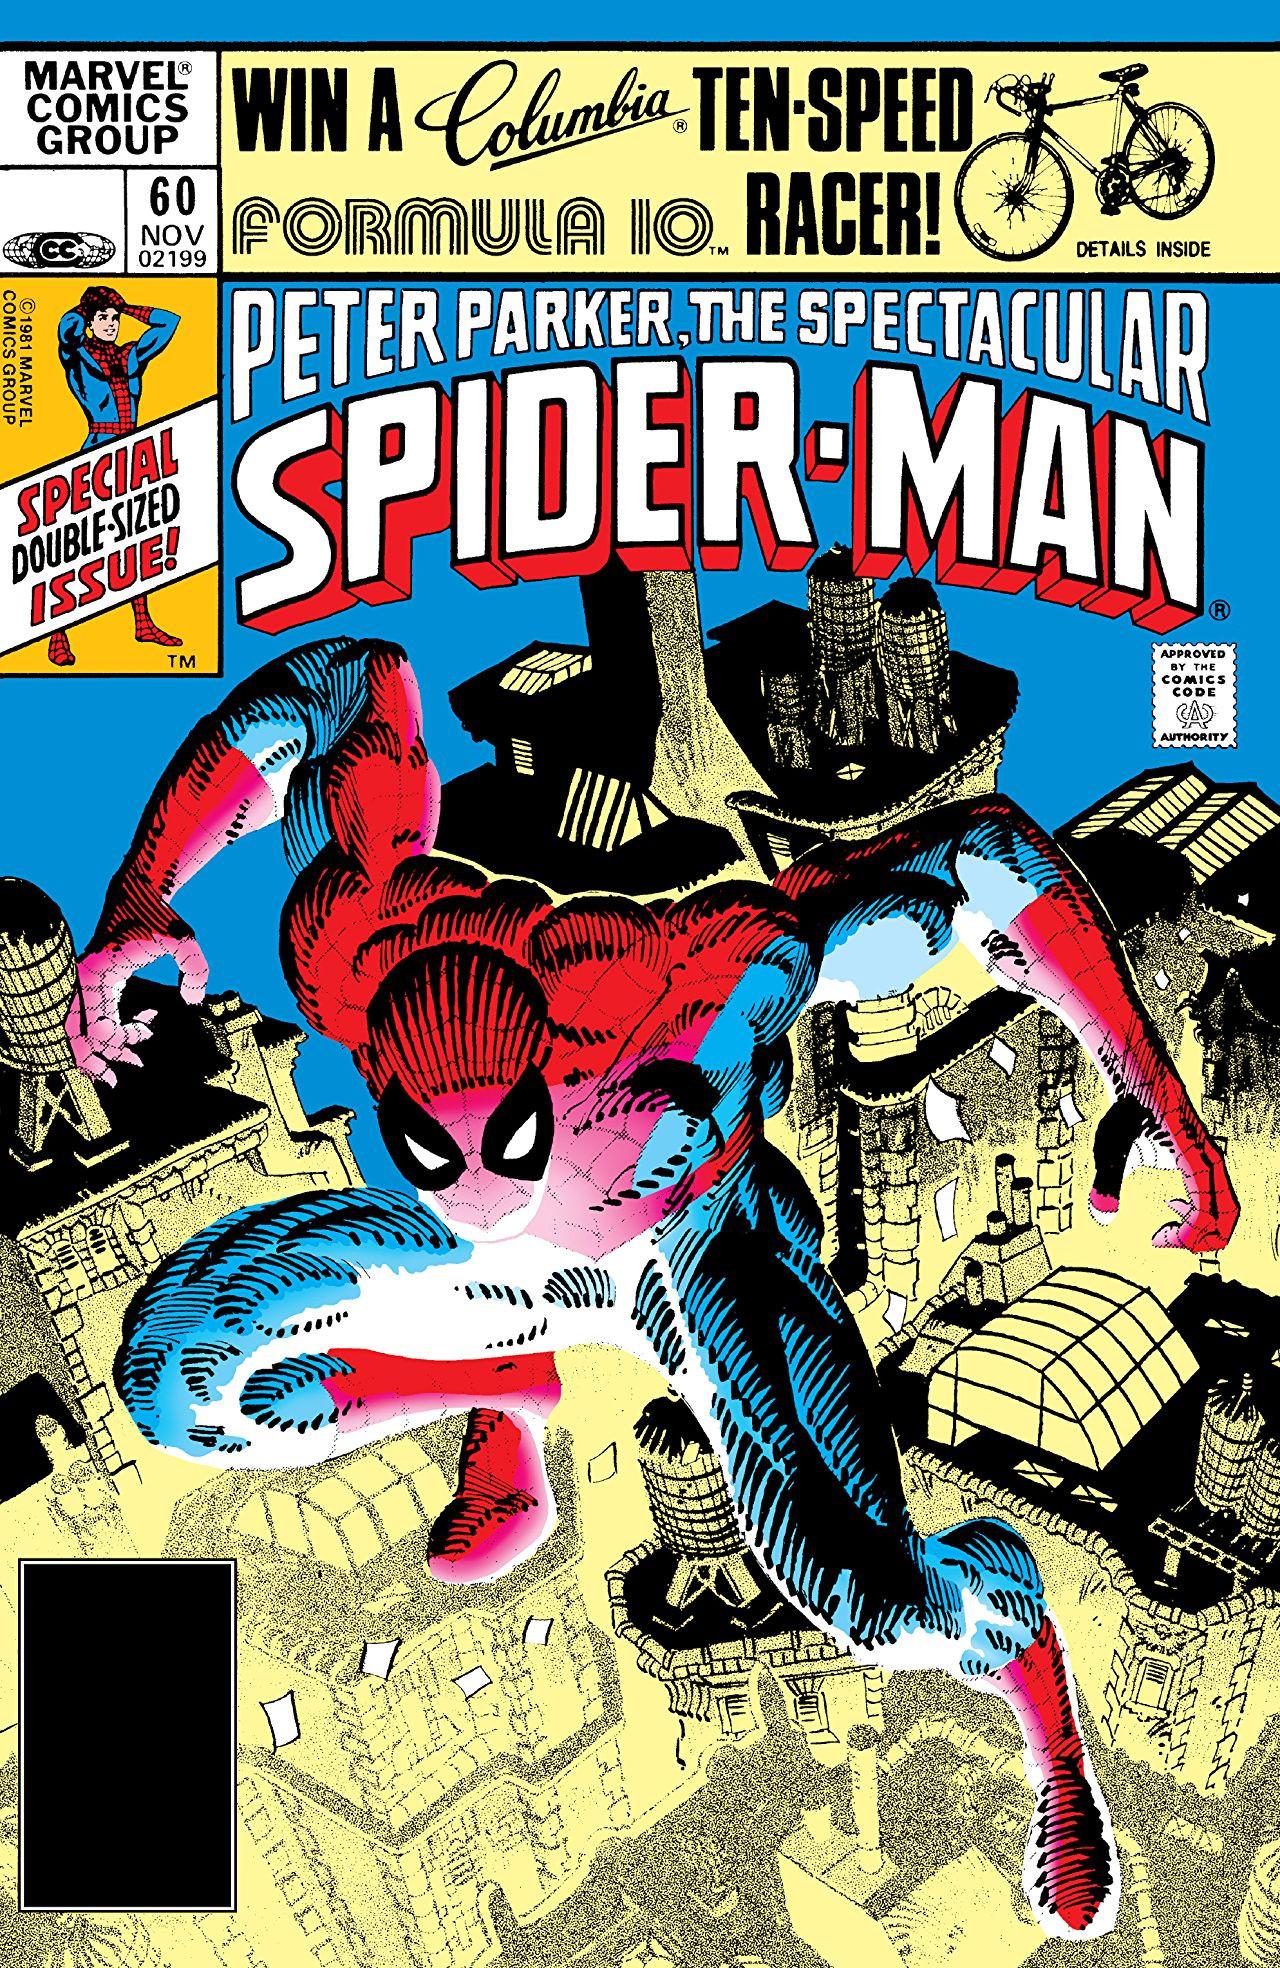 Peter Parker, The Spectacular Spider-Man Vol 1 60